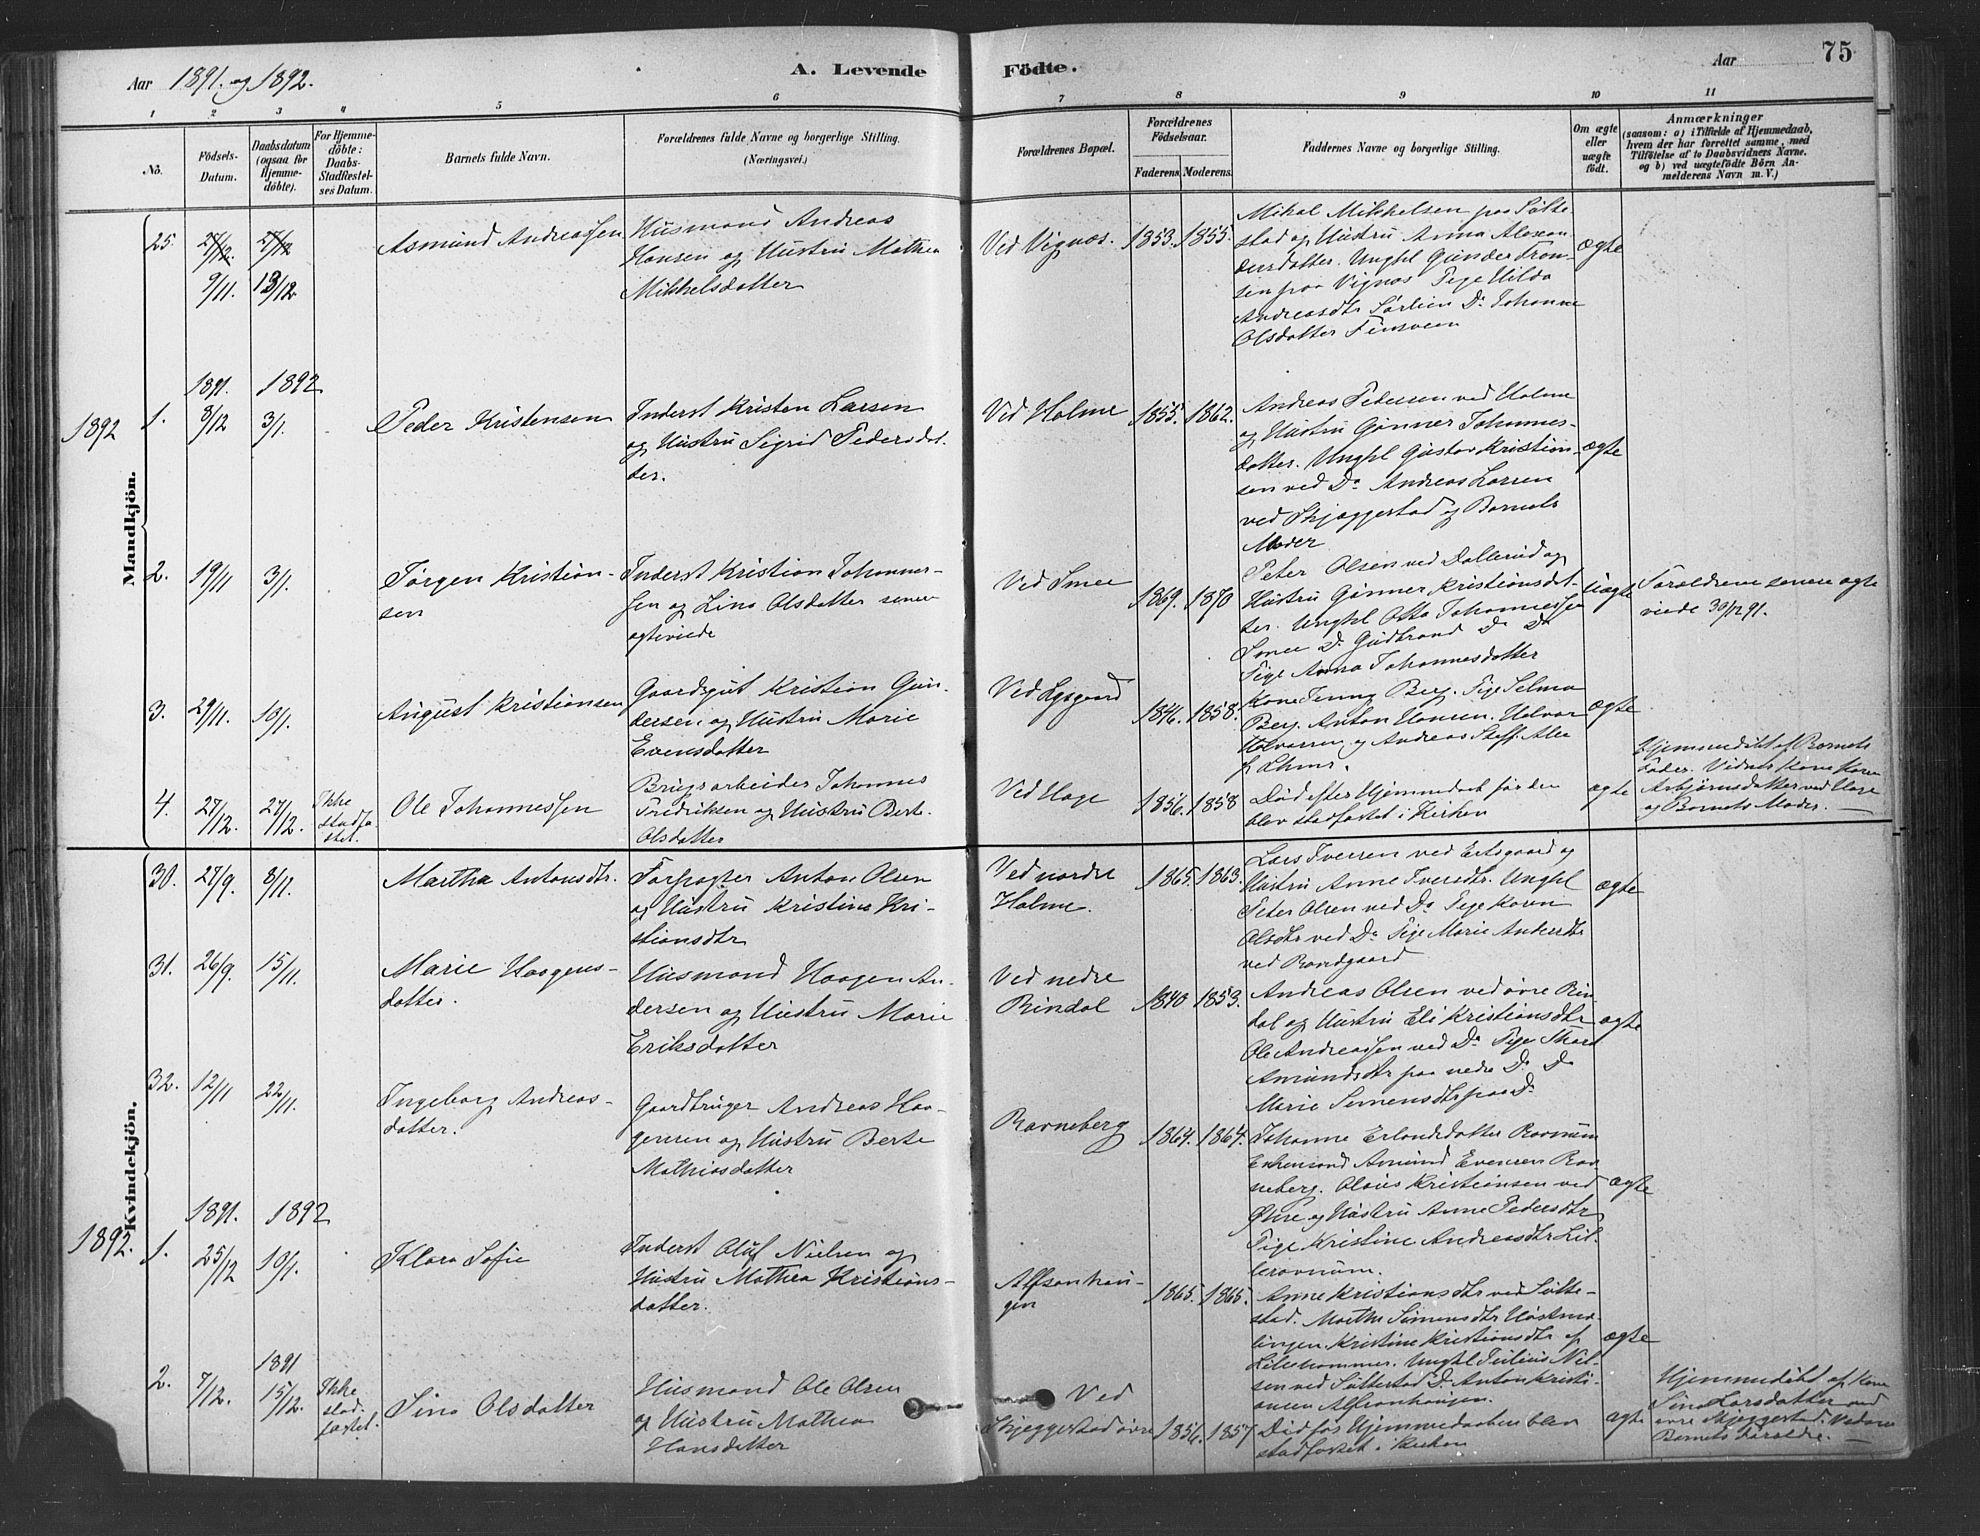 SAH, Fåberg prestekontor, Ministerialbok nr. 9, 1879-1898, s. 75